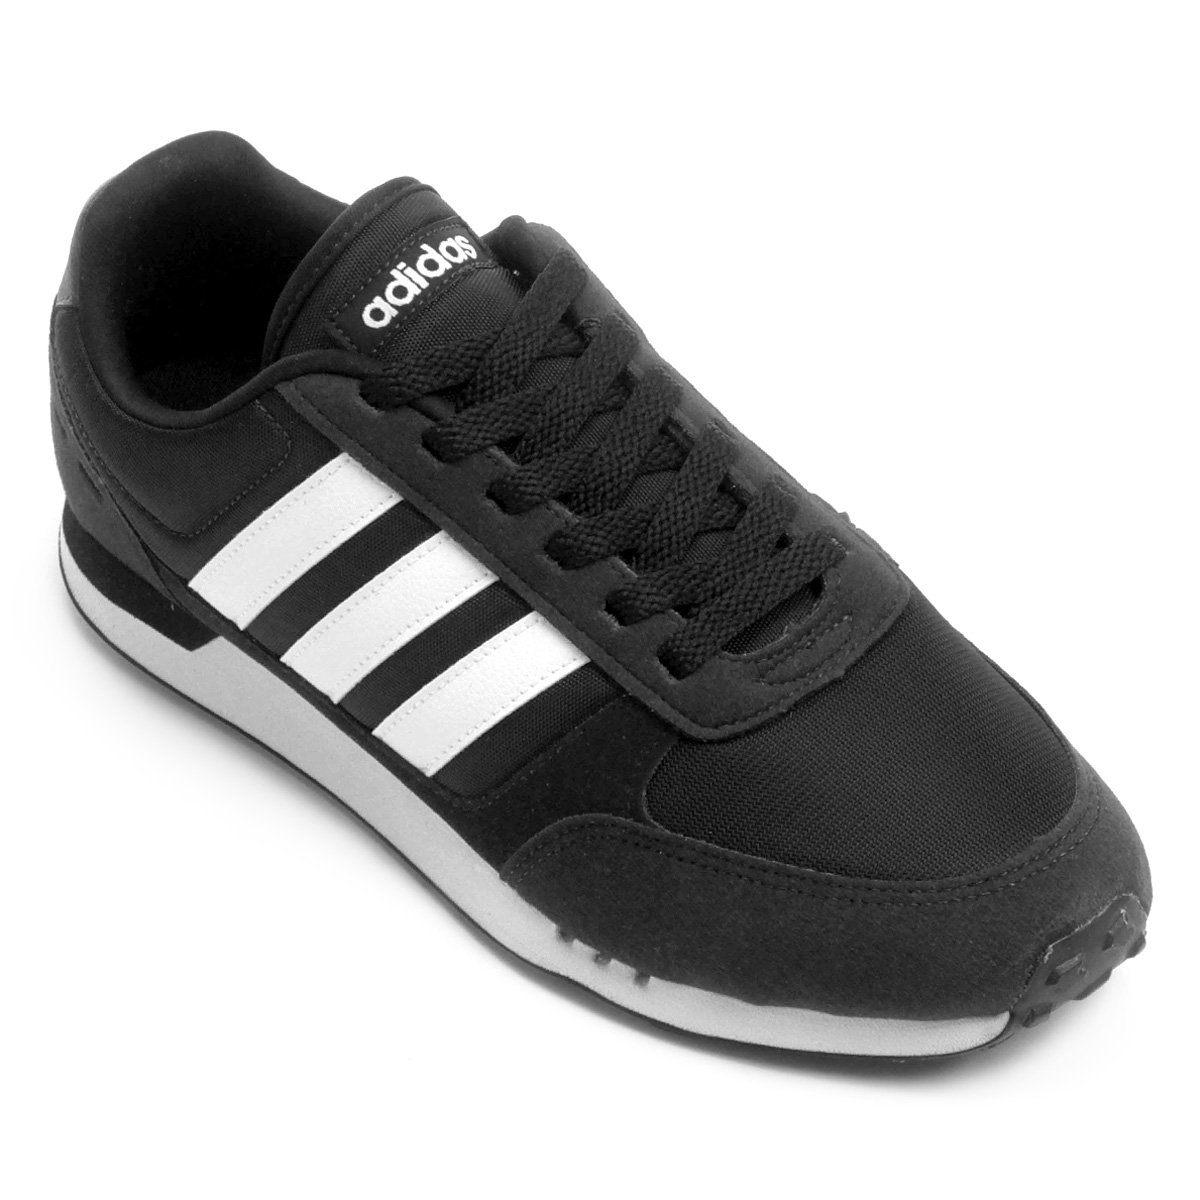 d4baab2b366 Tênis Adidas City Racer Masculino - Compre Agora